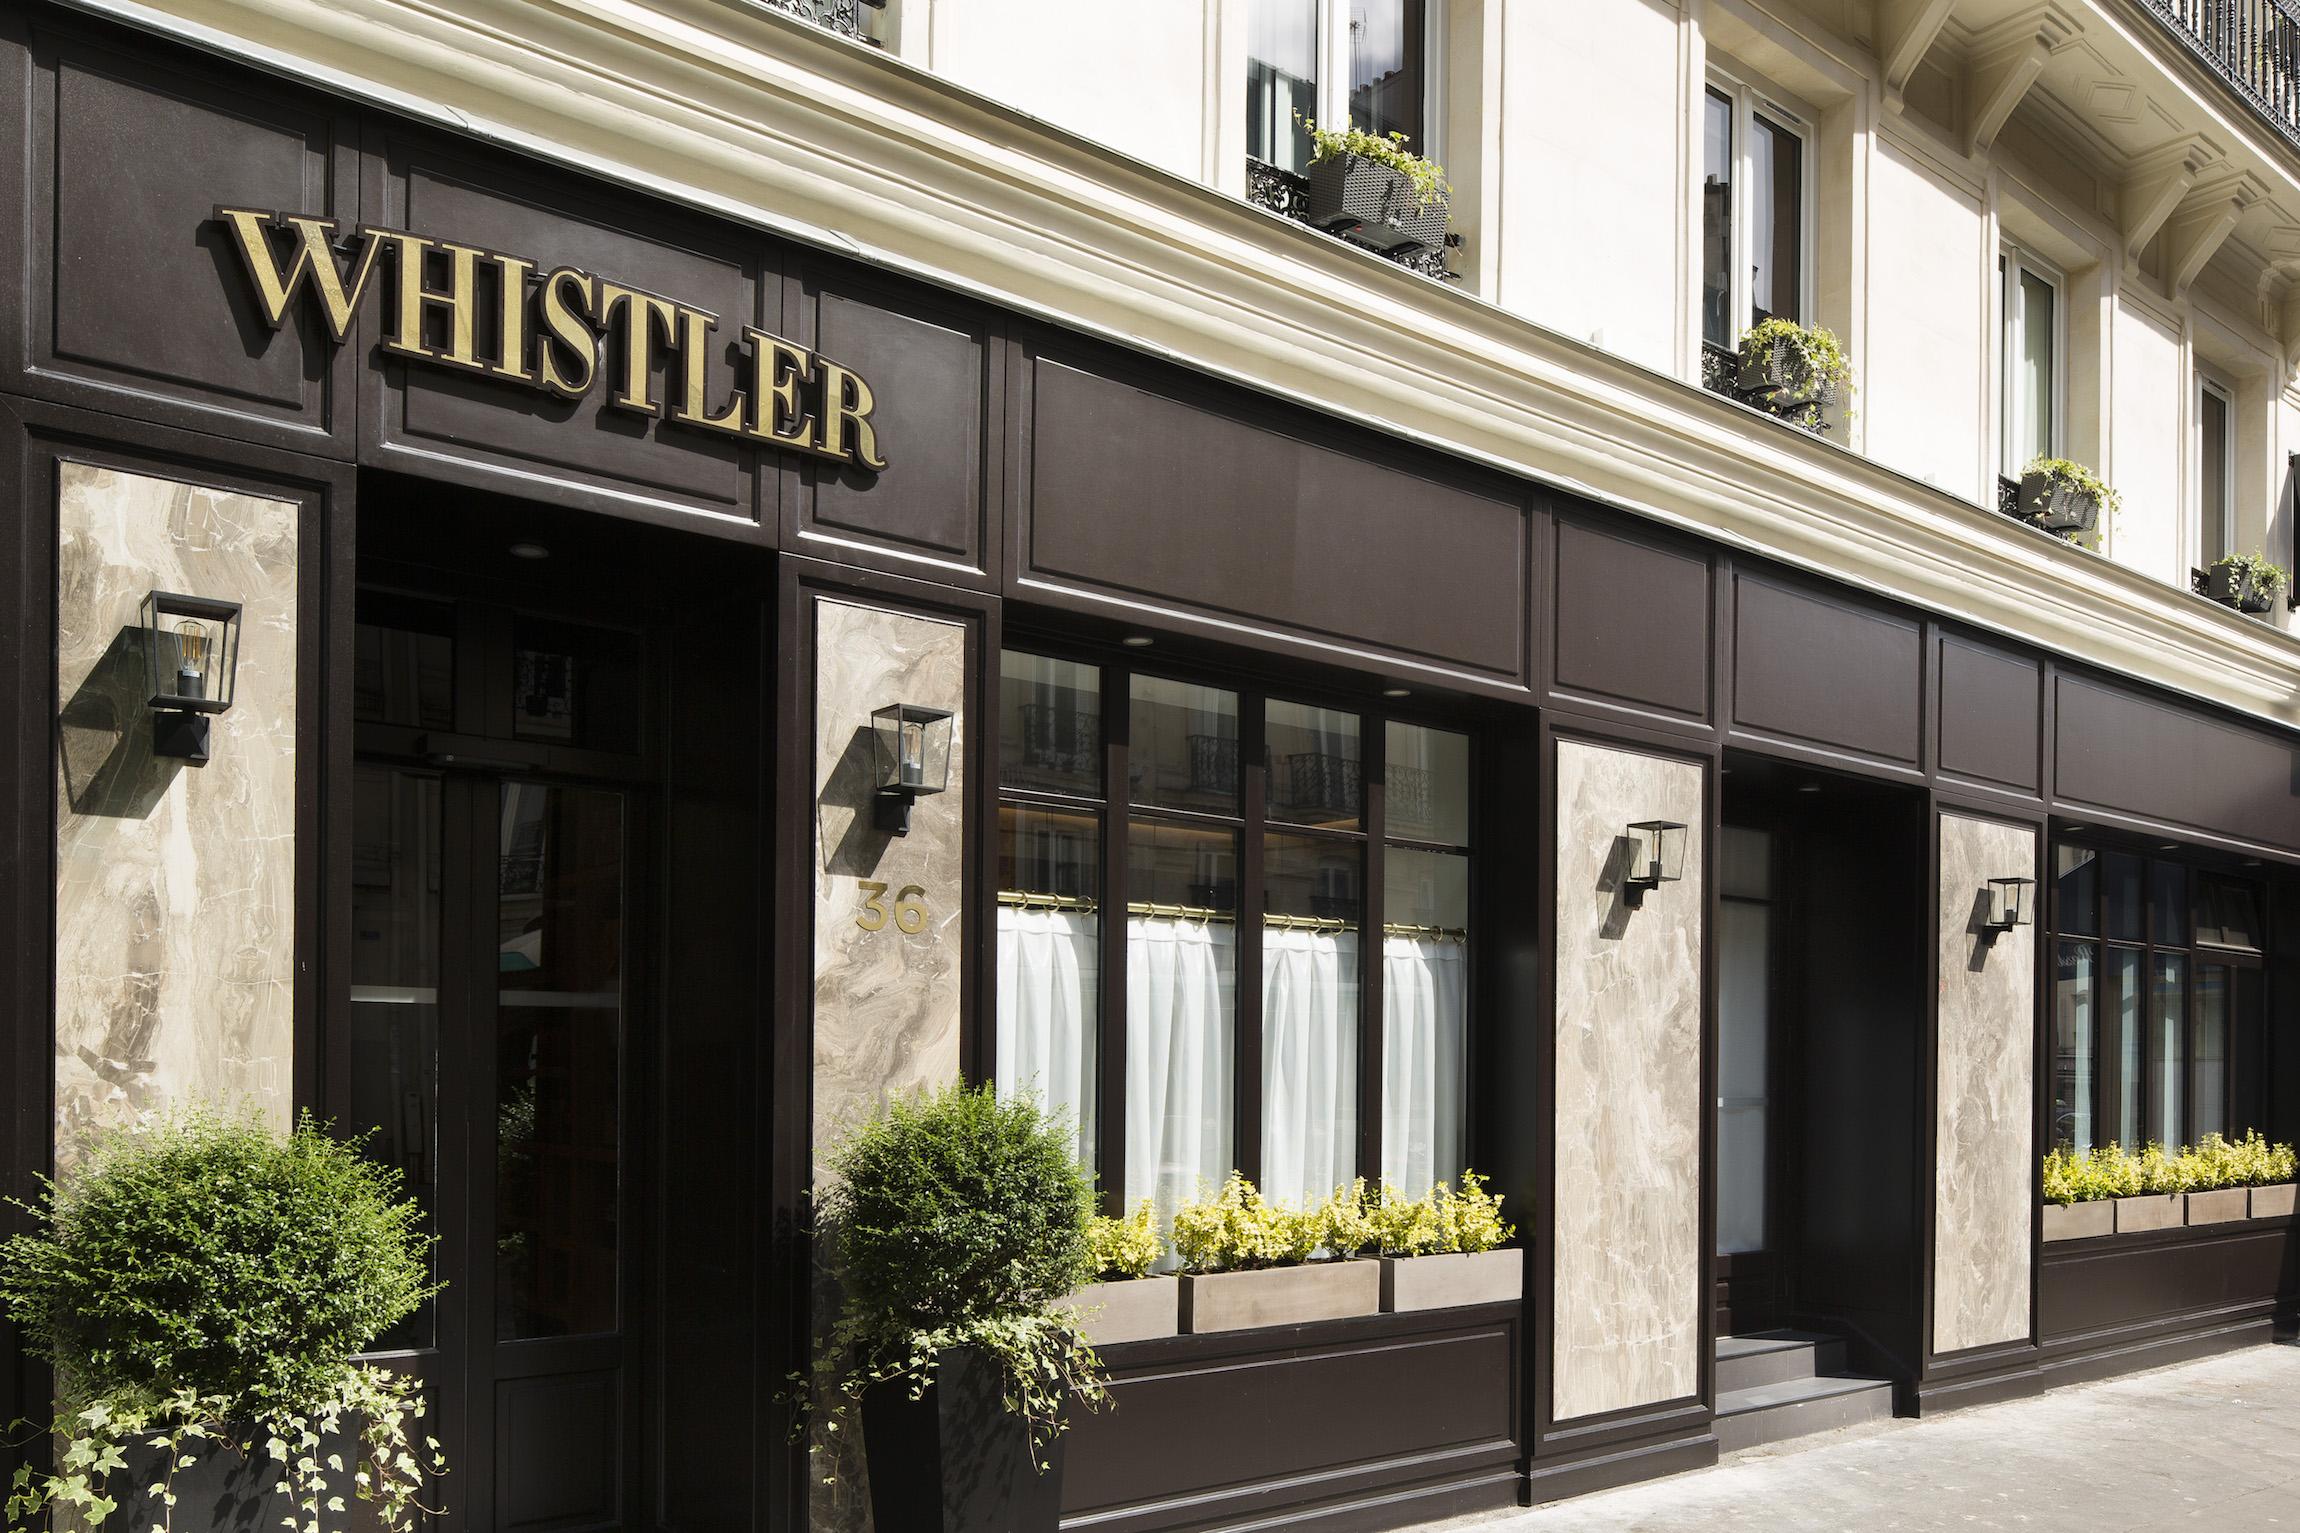 Hotel Whistler, Paris